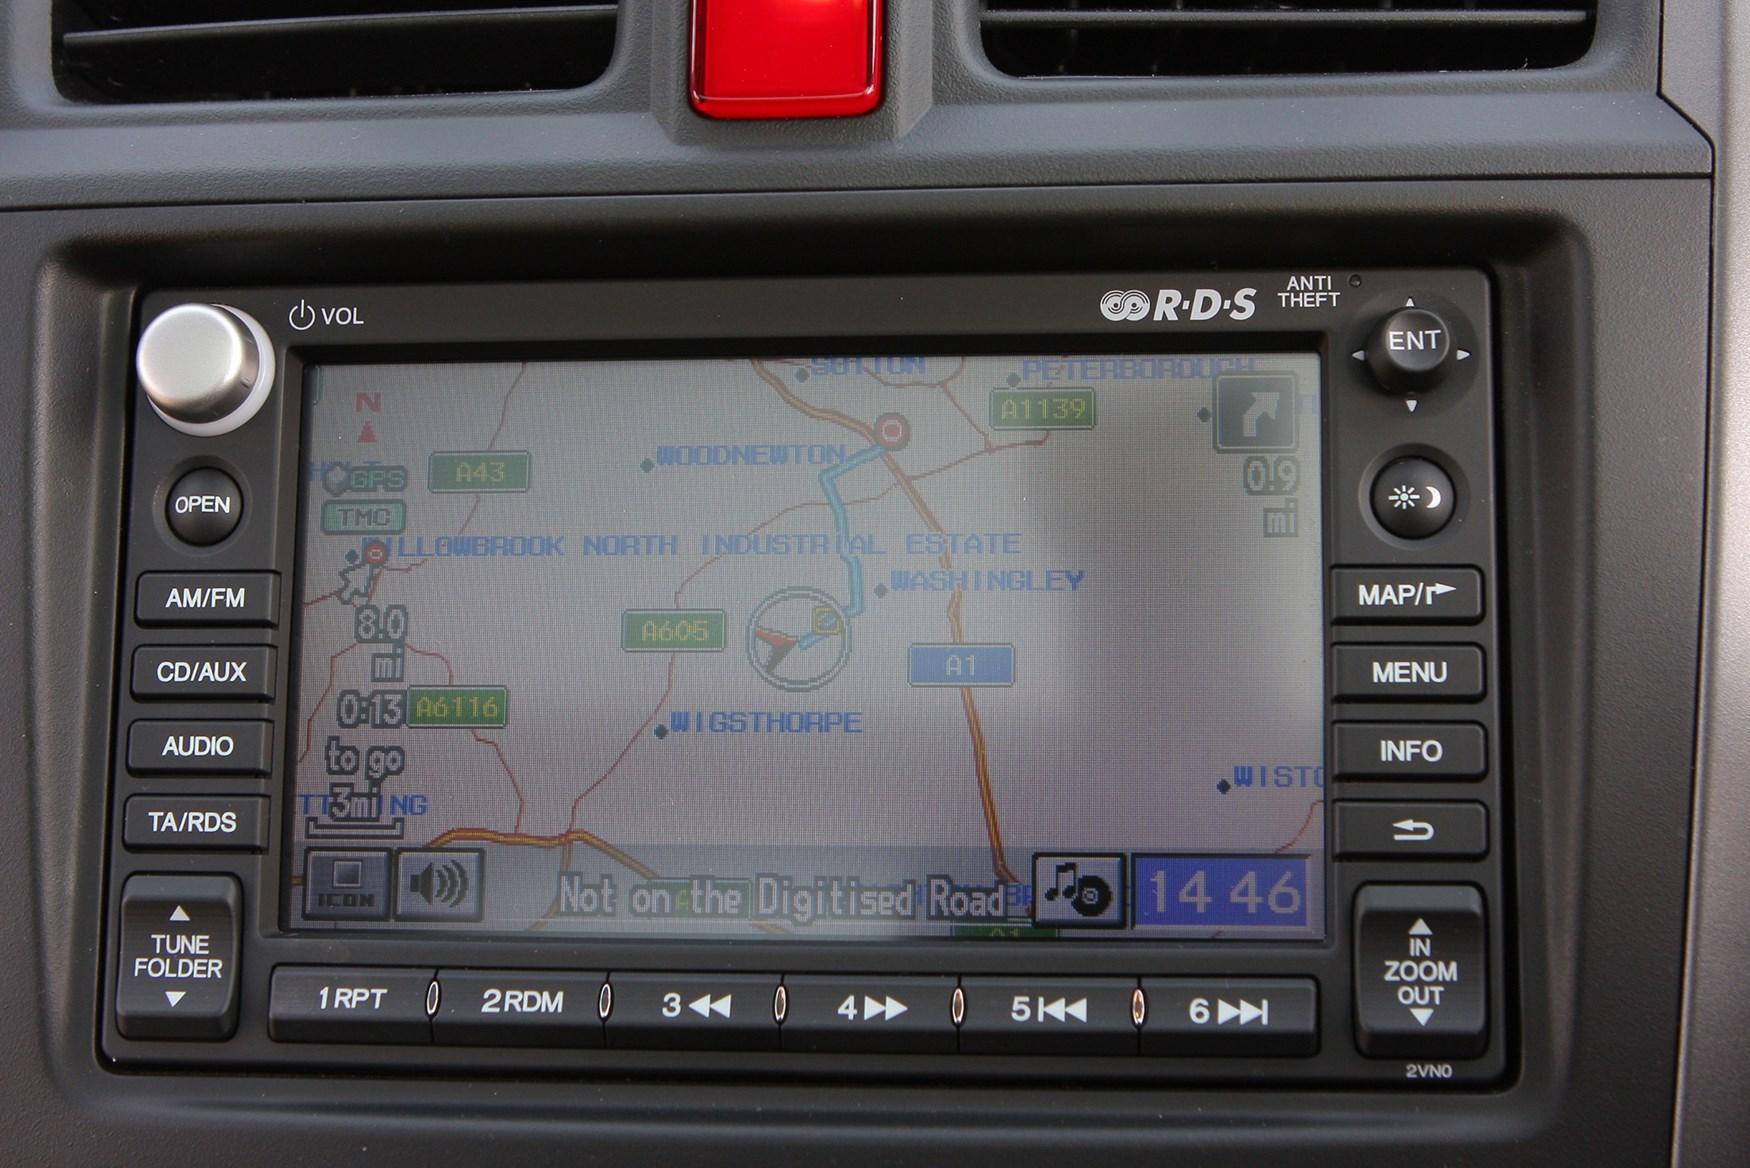 Used Honda CR-V Estate (2007 - 2012) Practicality | Parkers